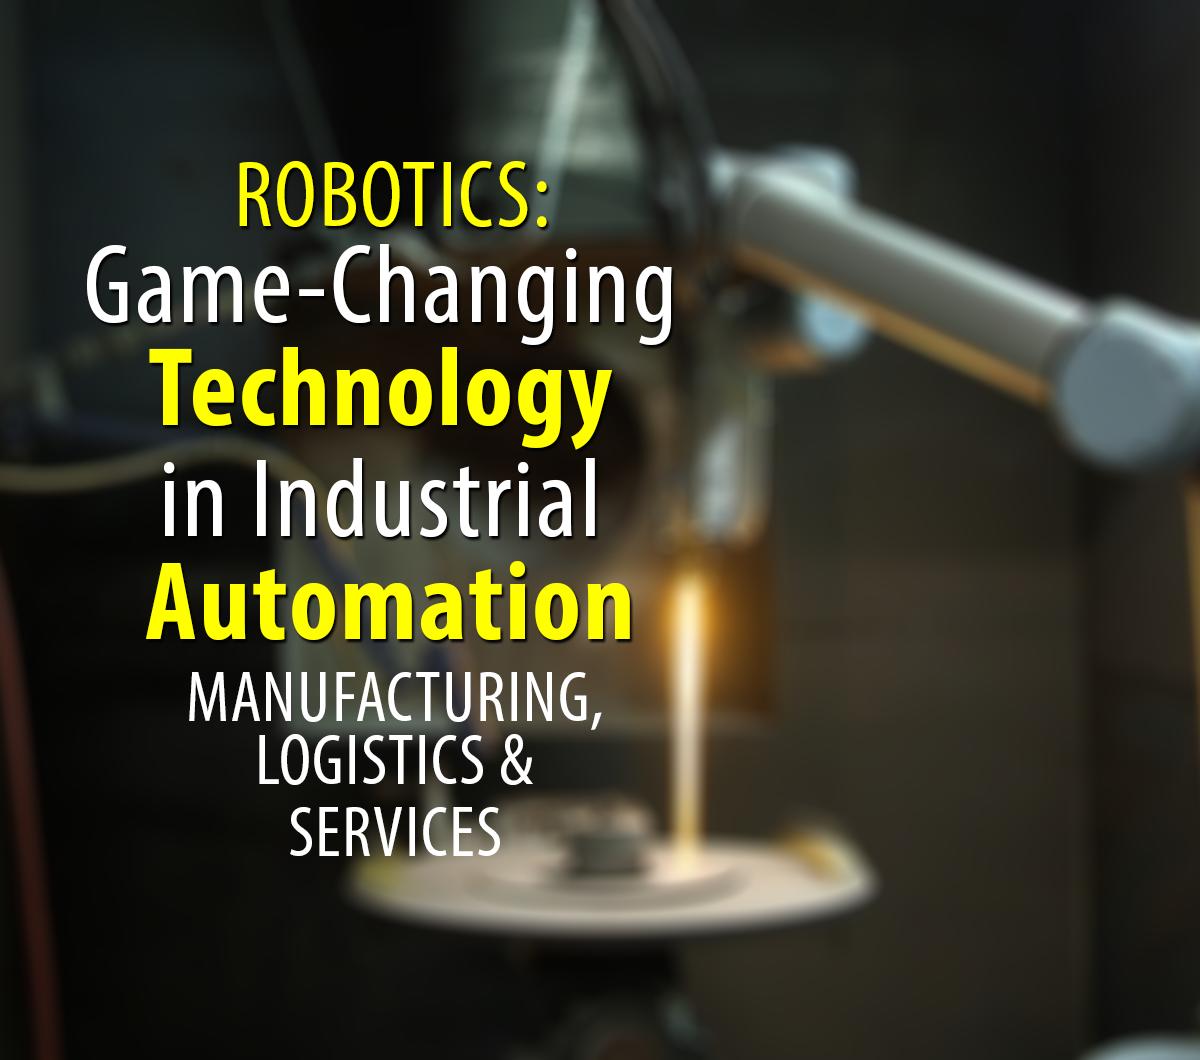 What's New in Robotics? 12.03.2021